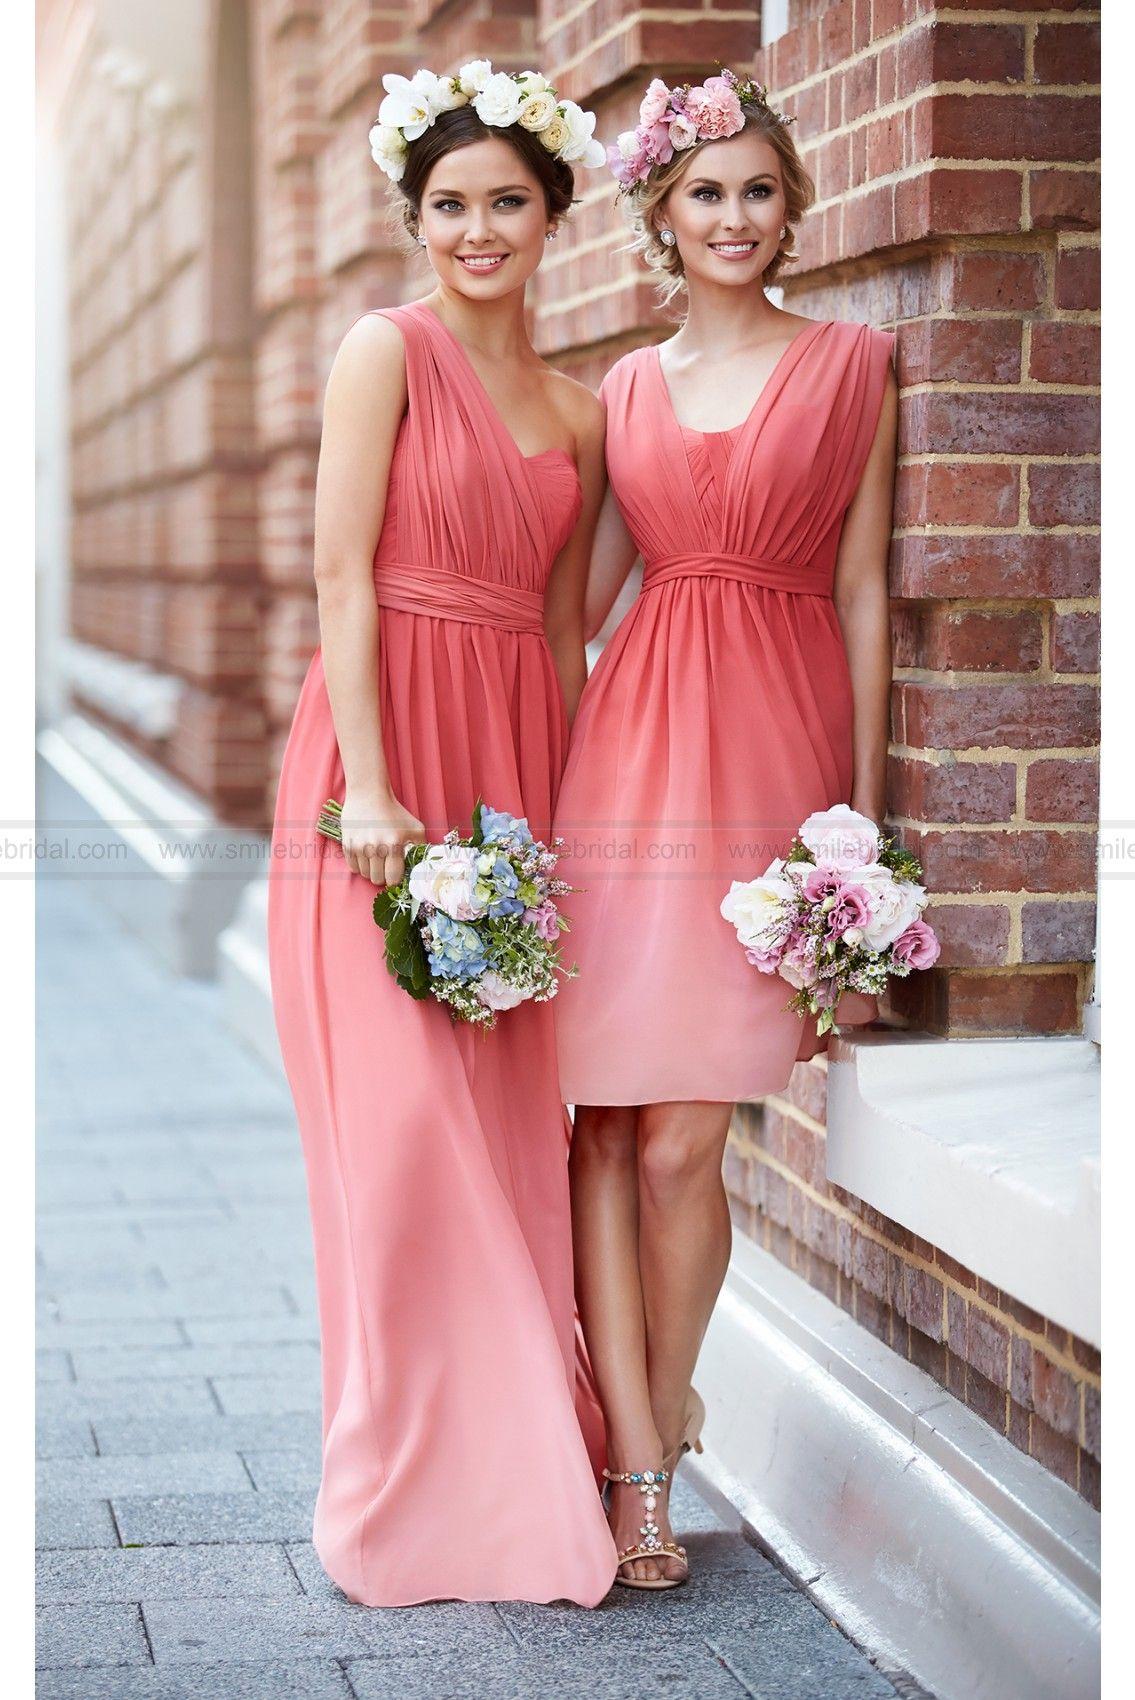 Sorella vita coral ombre bridesmaid dress style om bridesmaid